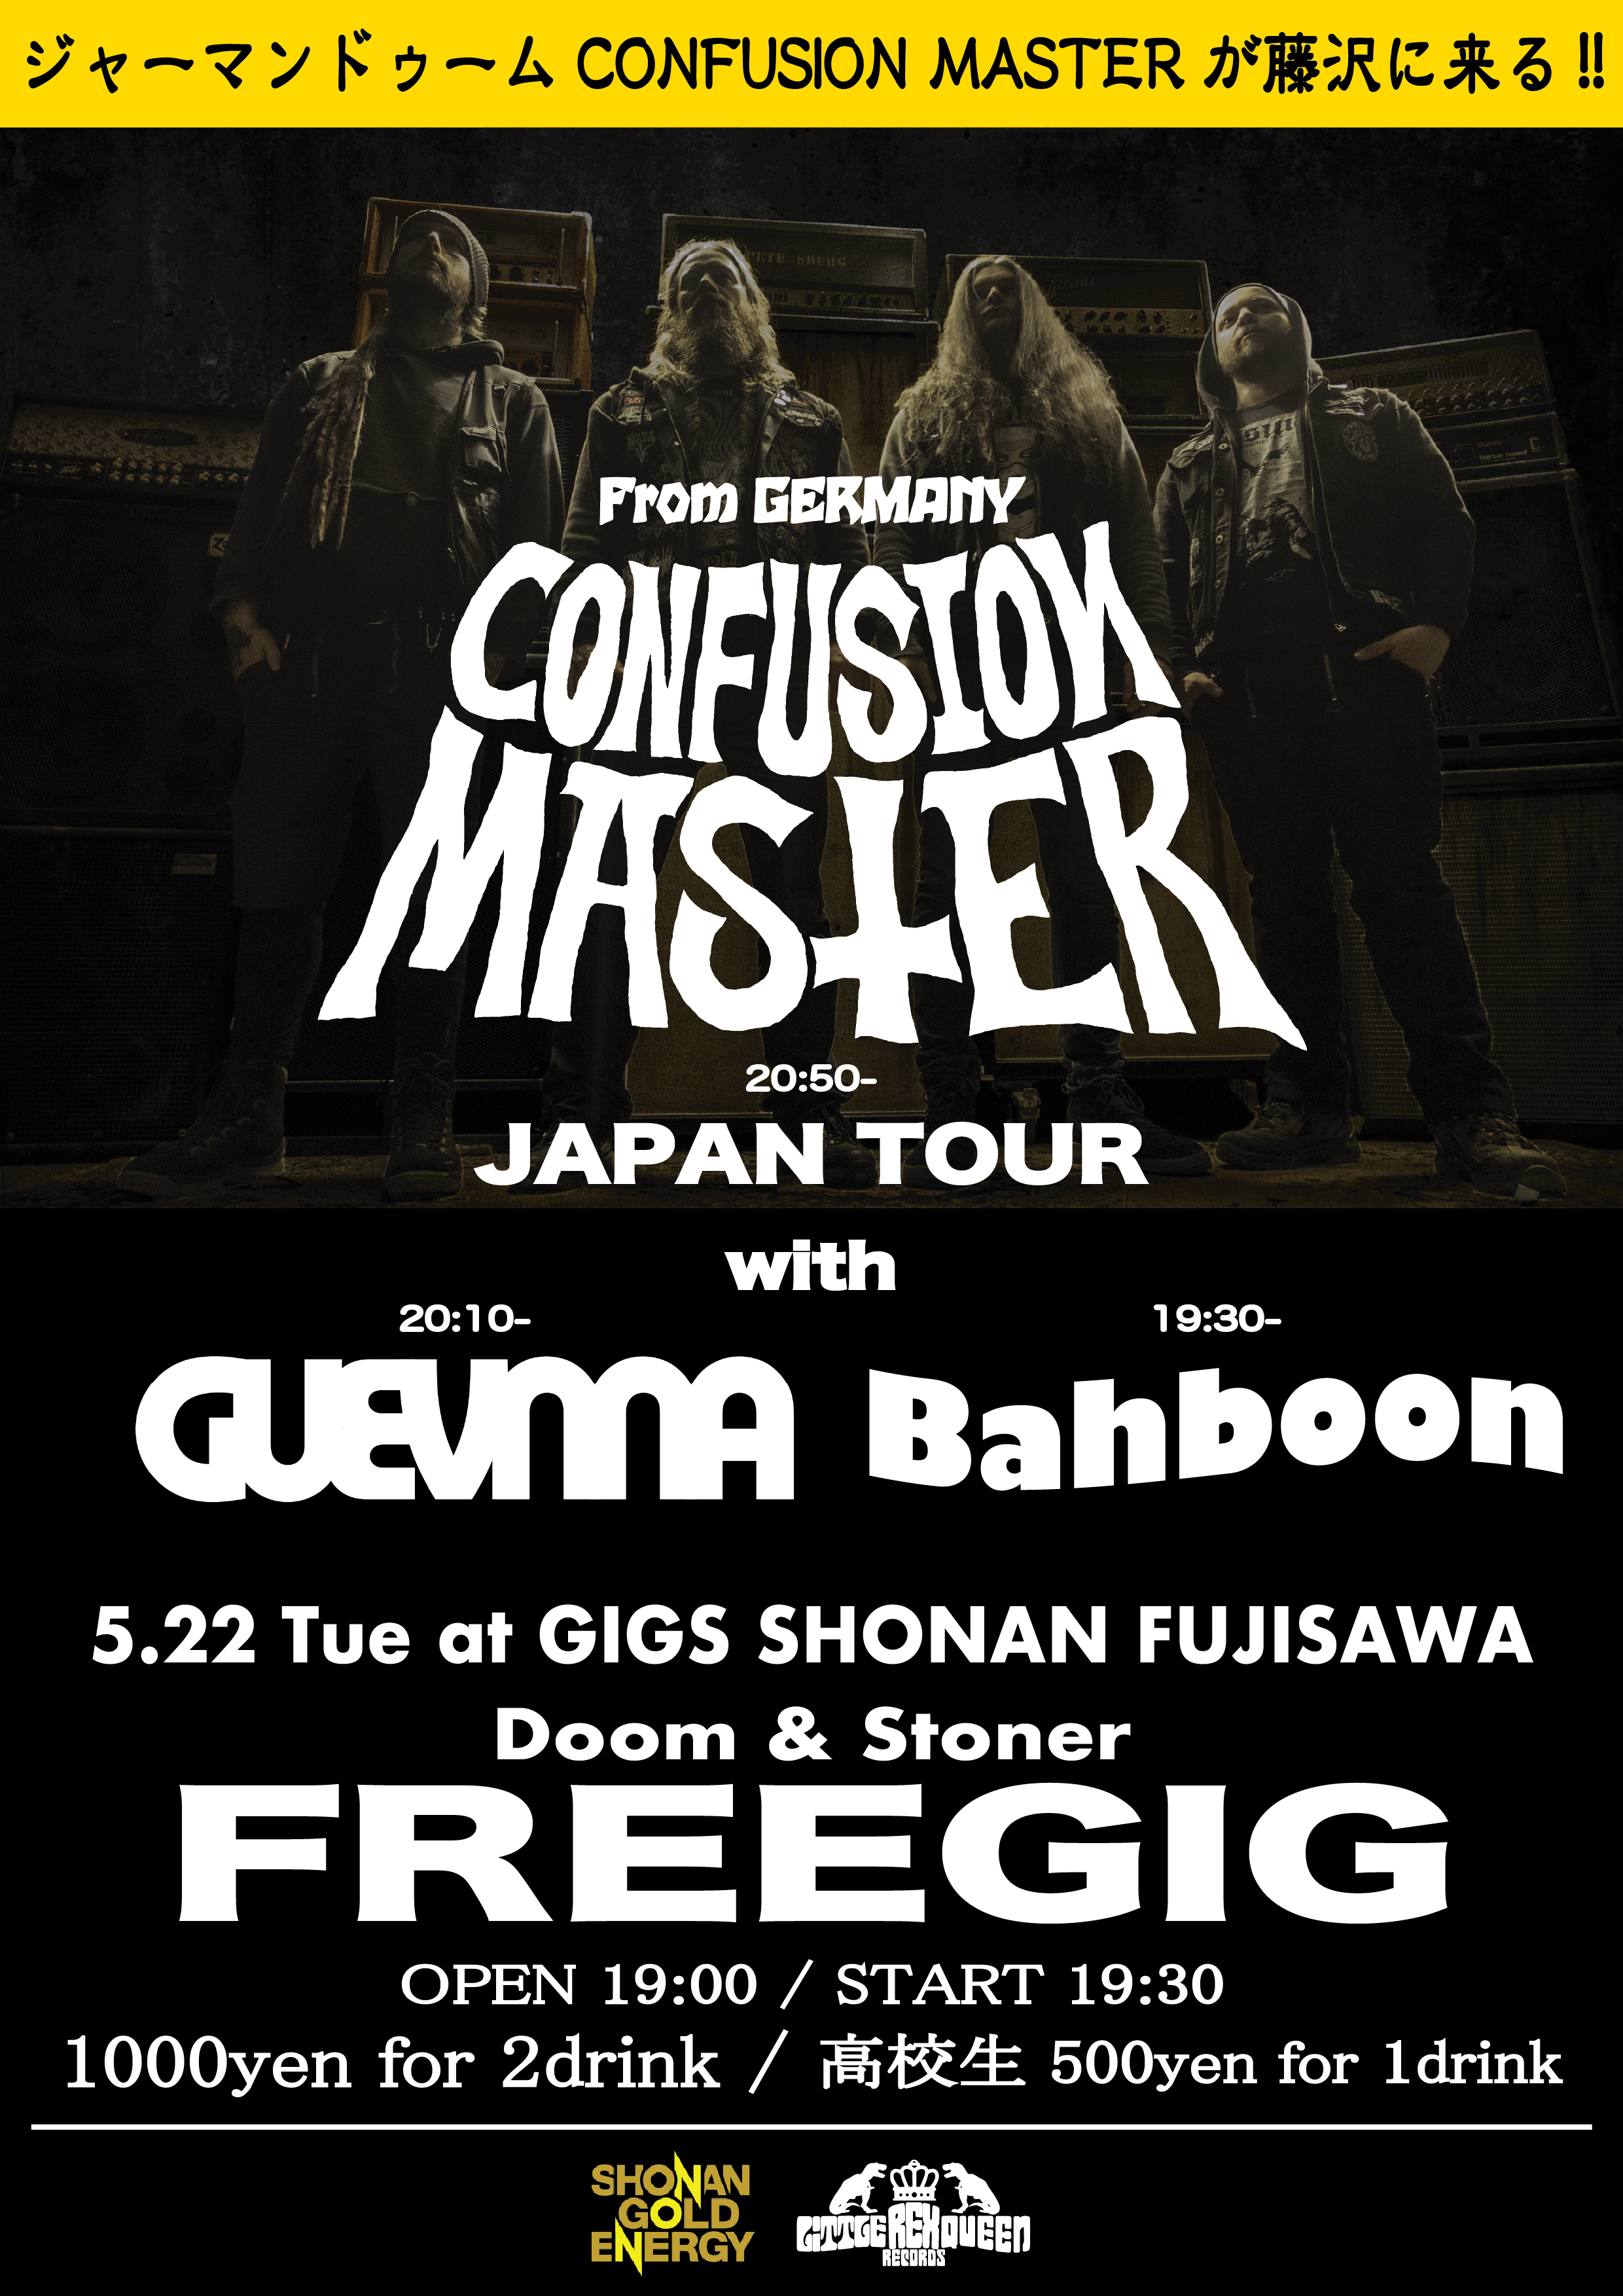 CONFUSION MASTER JAPAN TOUR